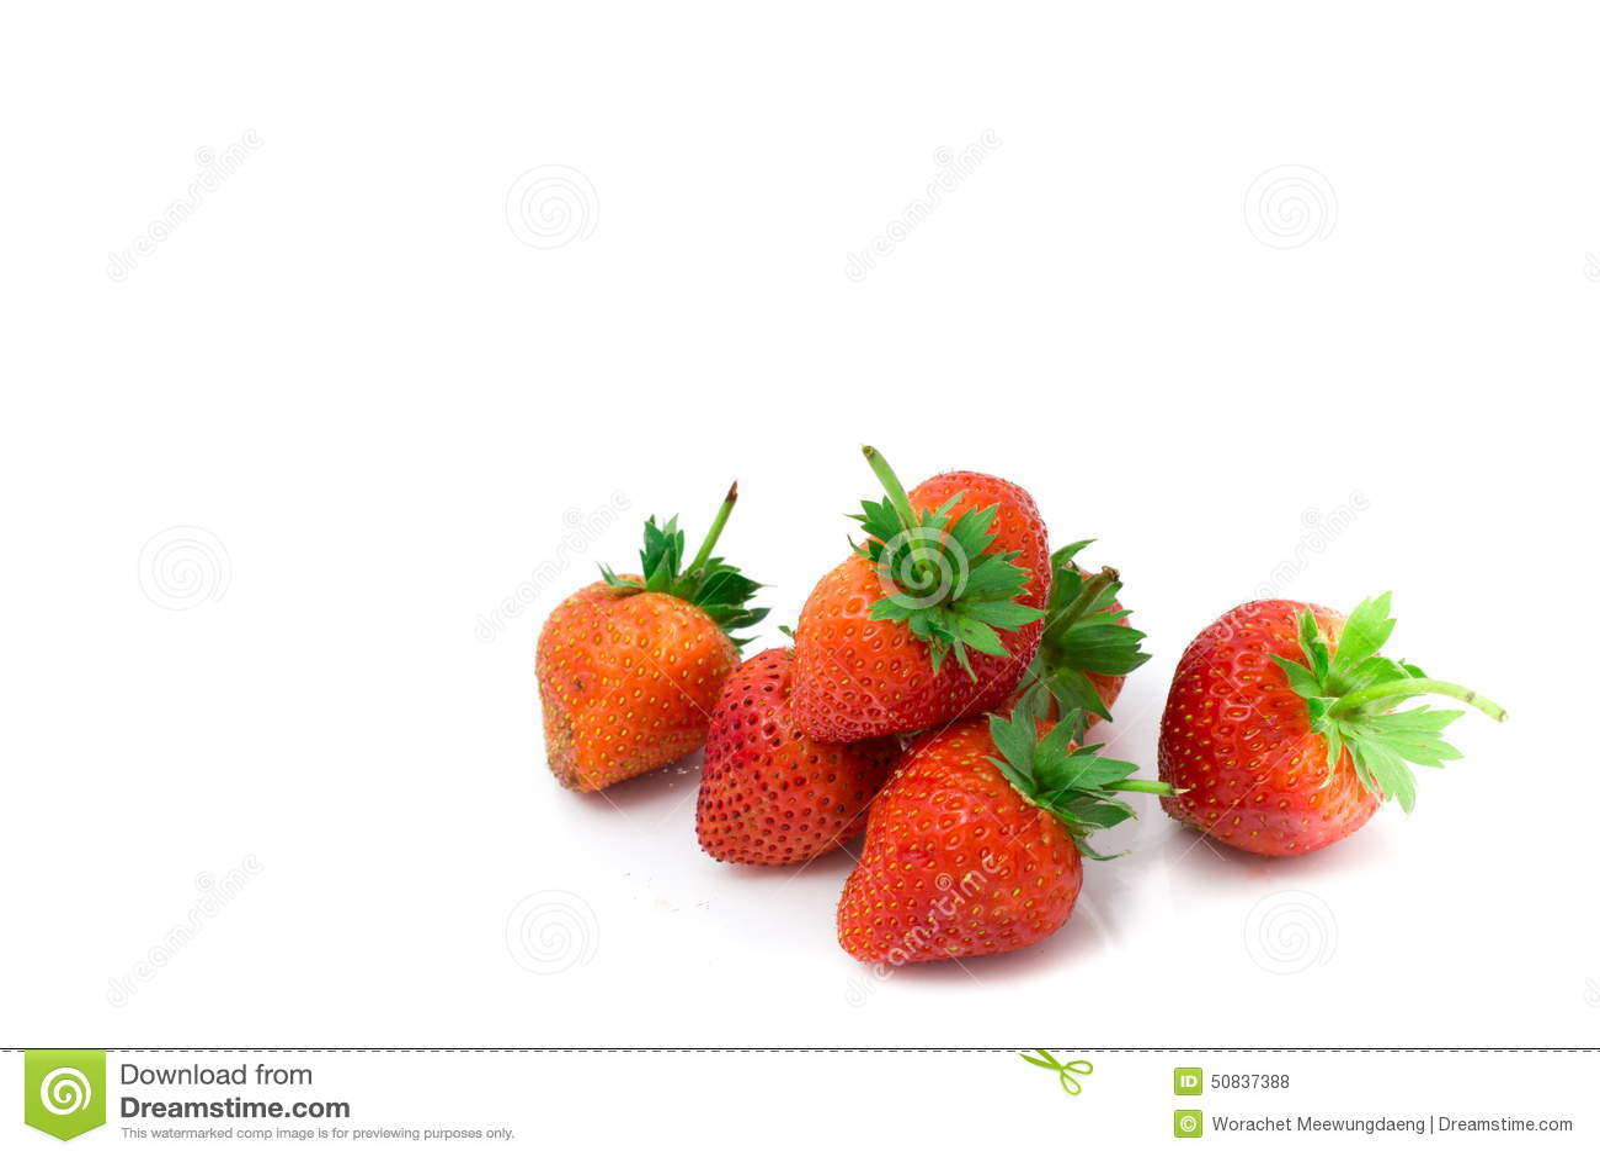 Fresh strawberry on white background.